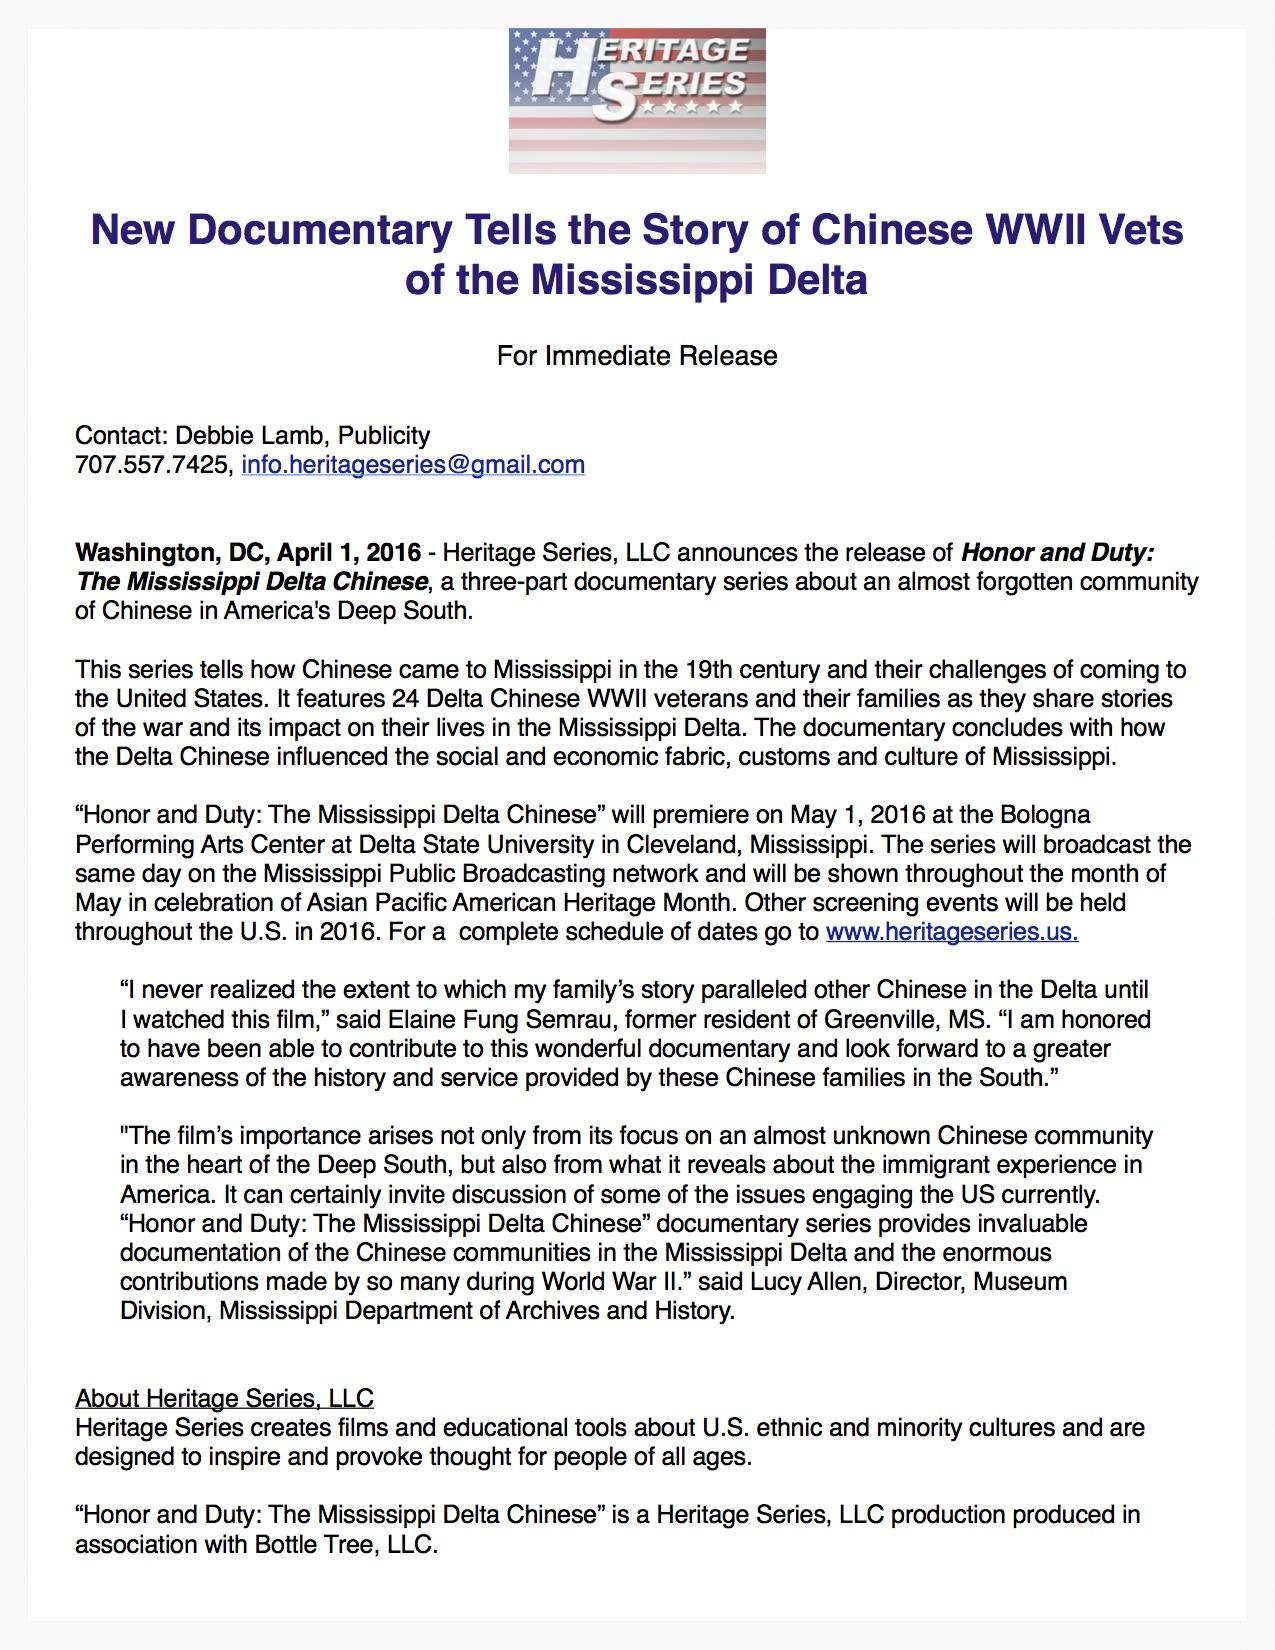 New Documentary tells story of Chinese Veterans of Mississippi Delta